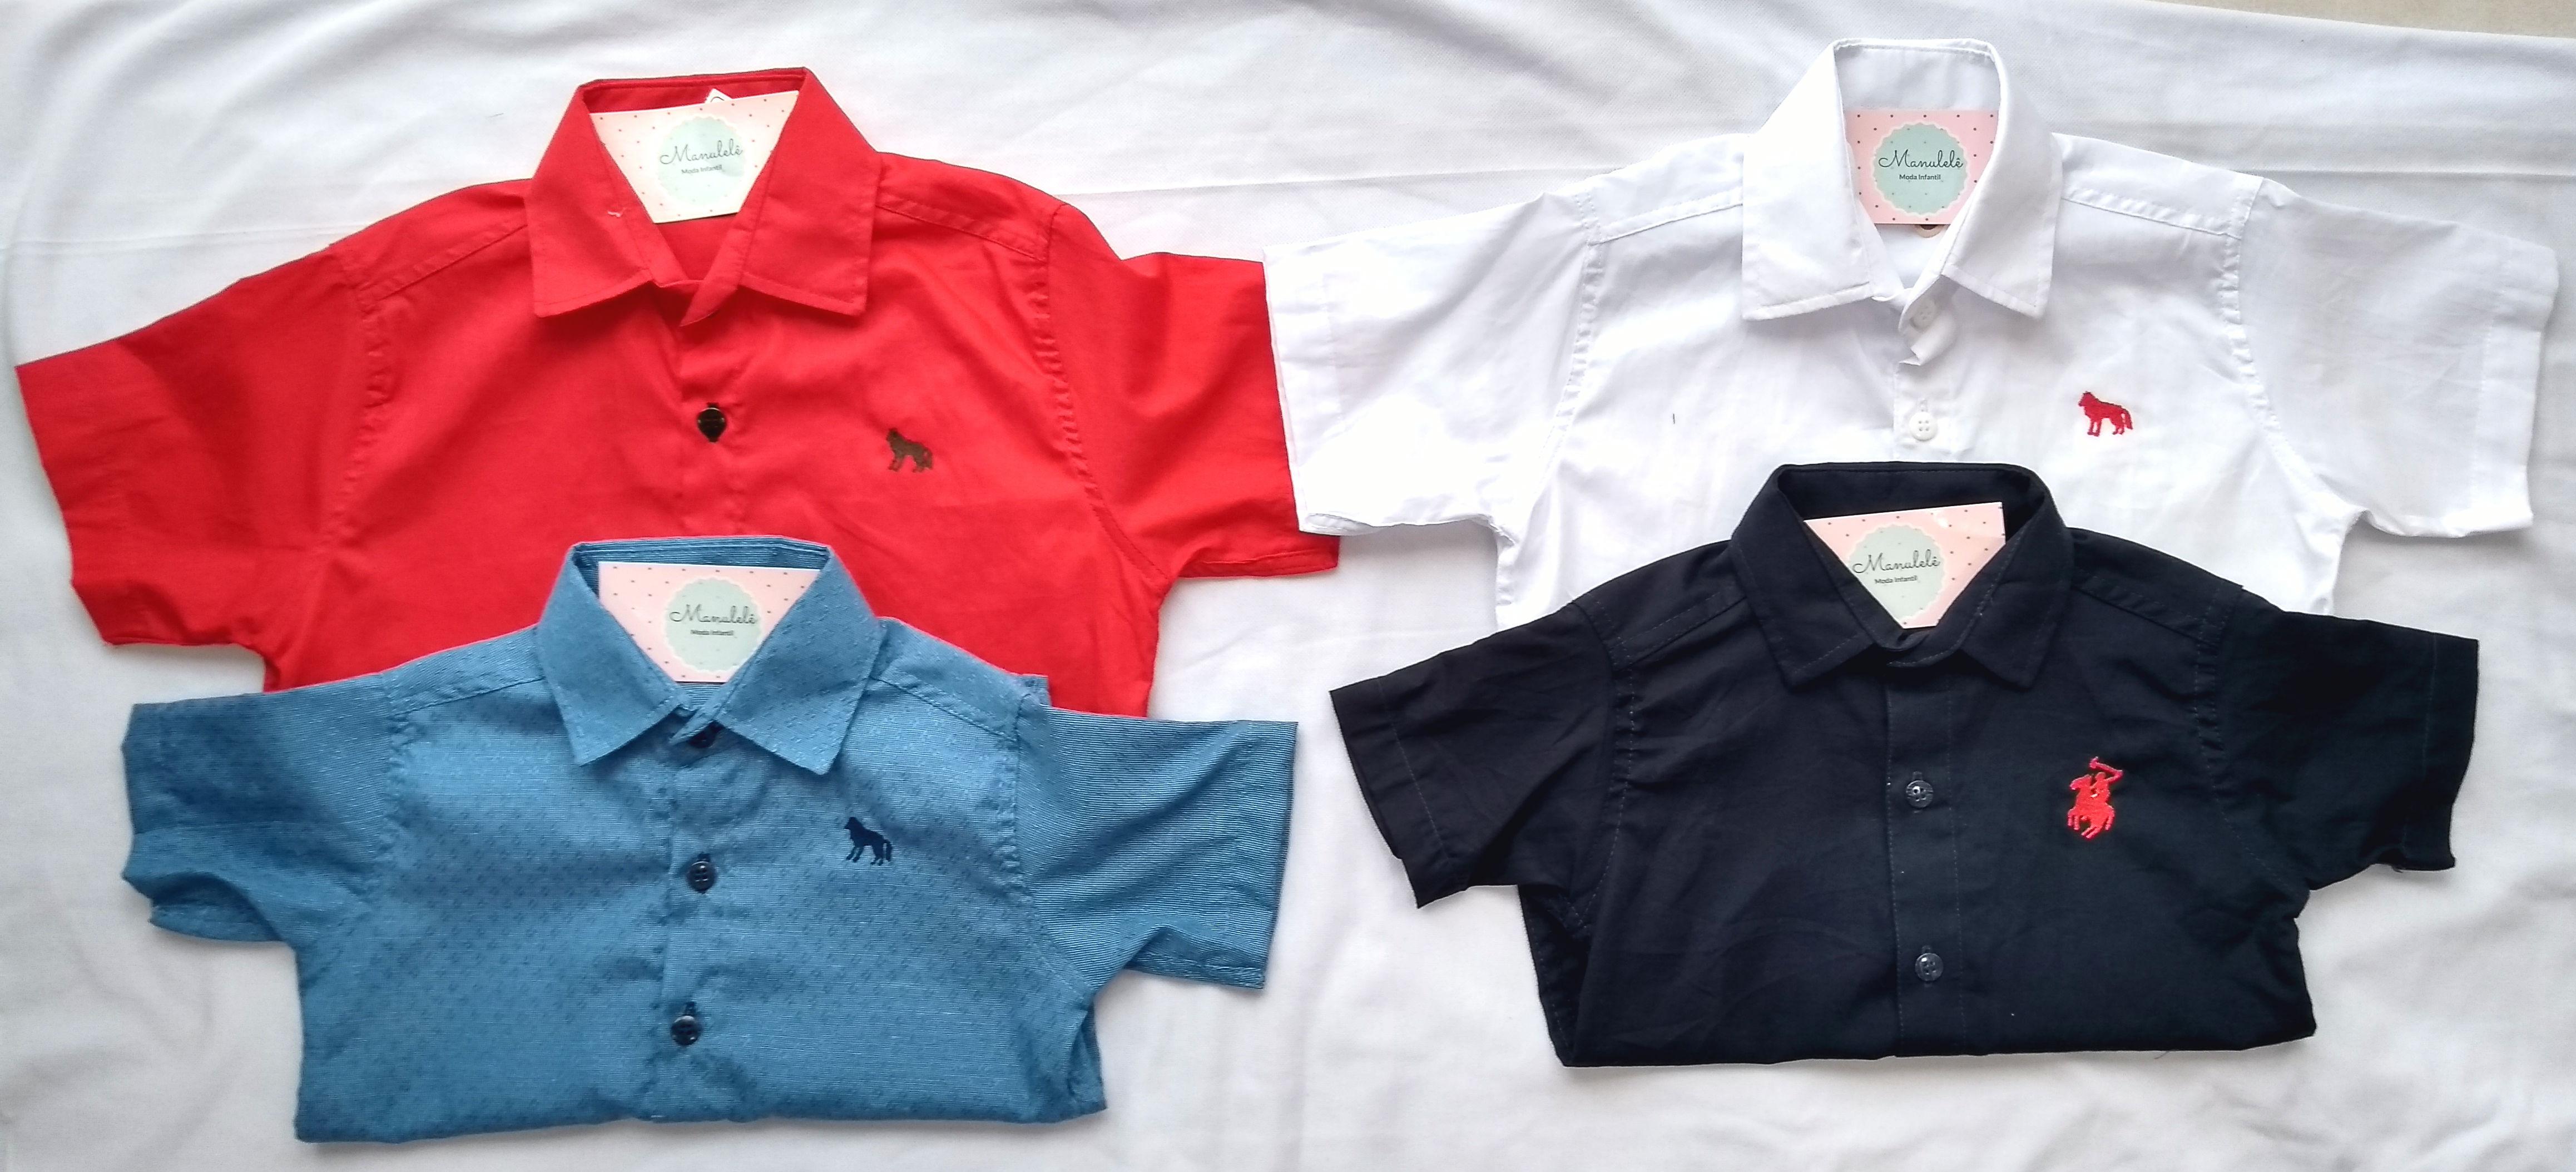 Camisa social infantilmasculina